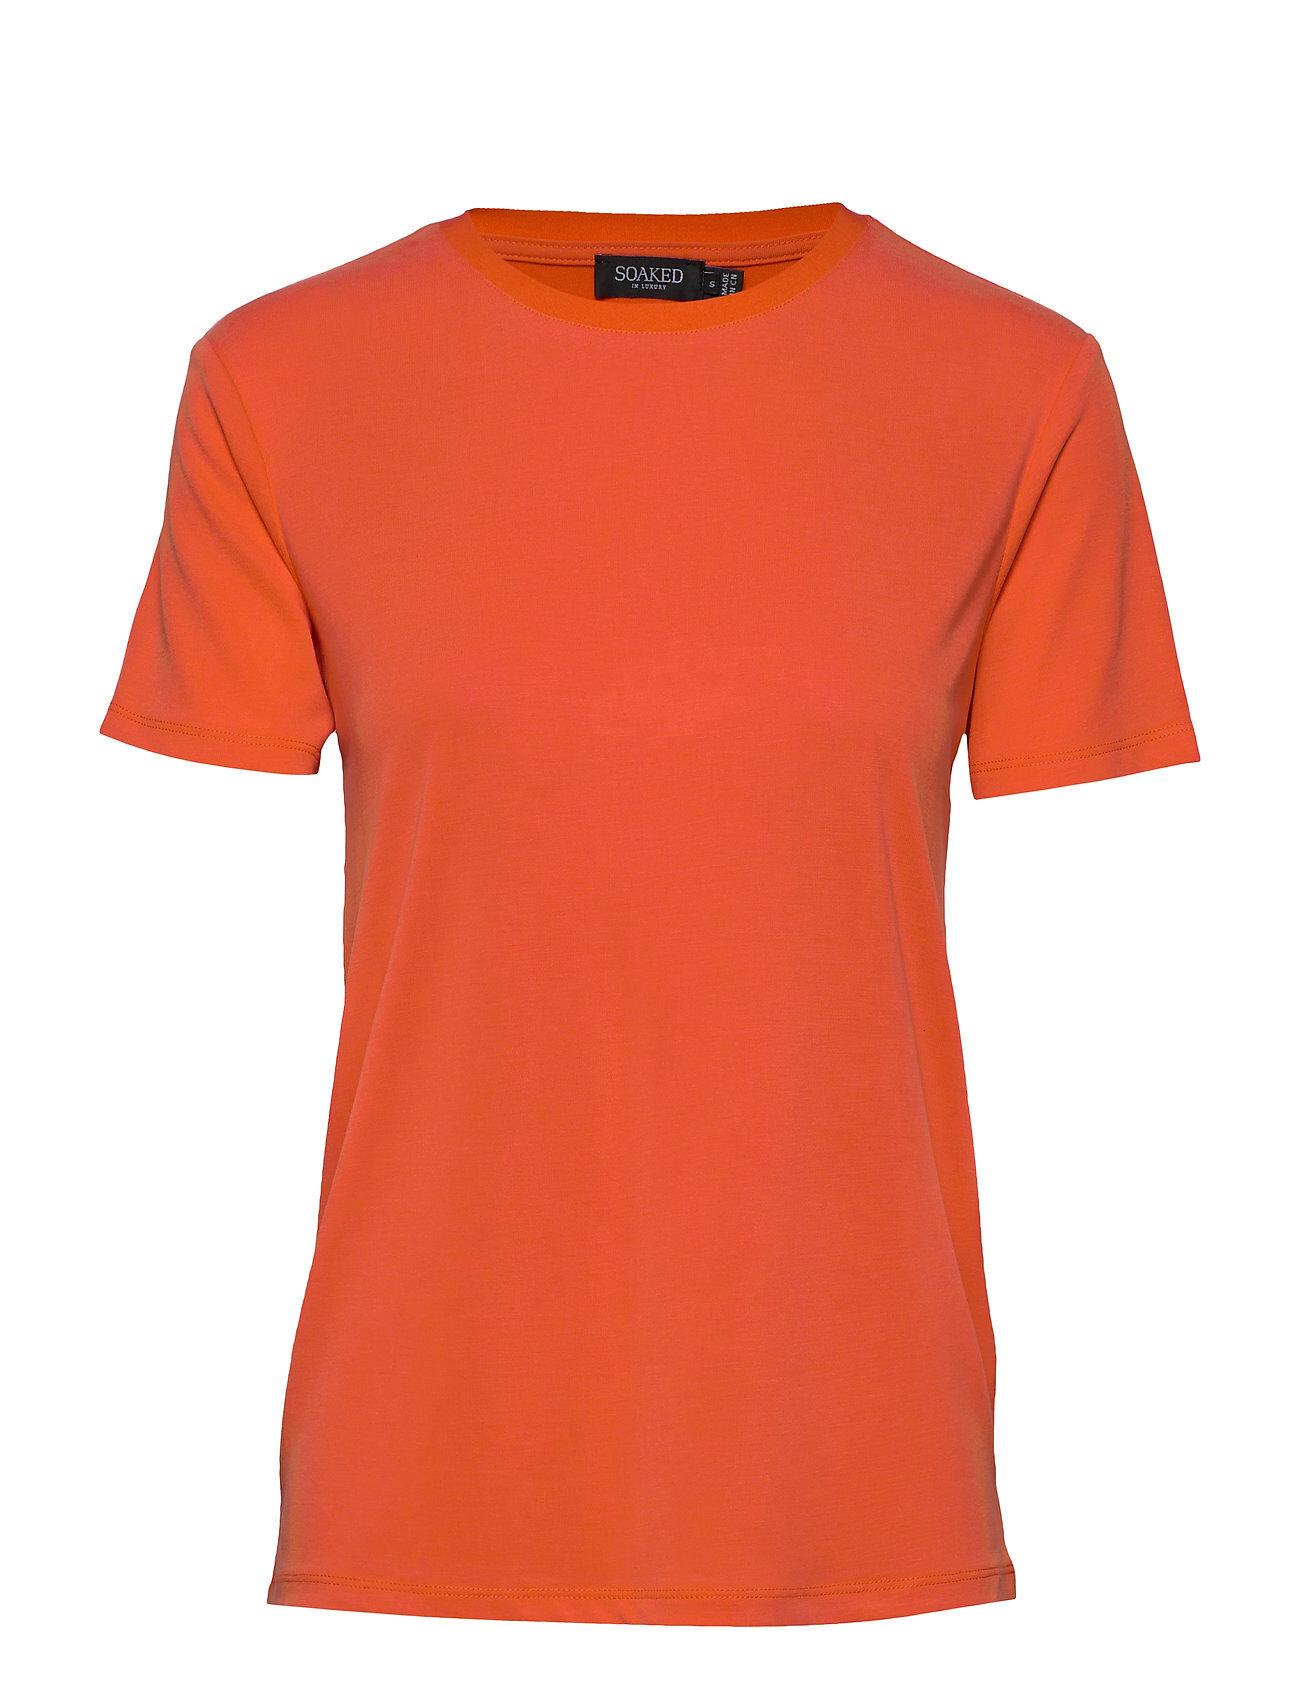 Soaked in Luxury Slcolumbine Crew-Neck T-Shirt Ss T-shirts & Tops Short-sleeved Soaked In Luxury